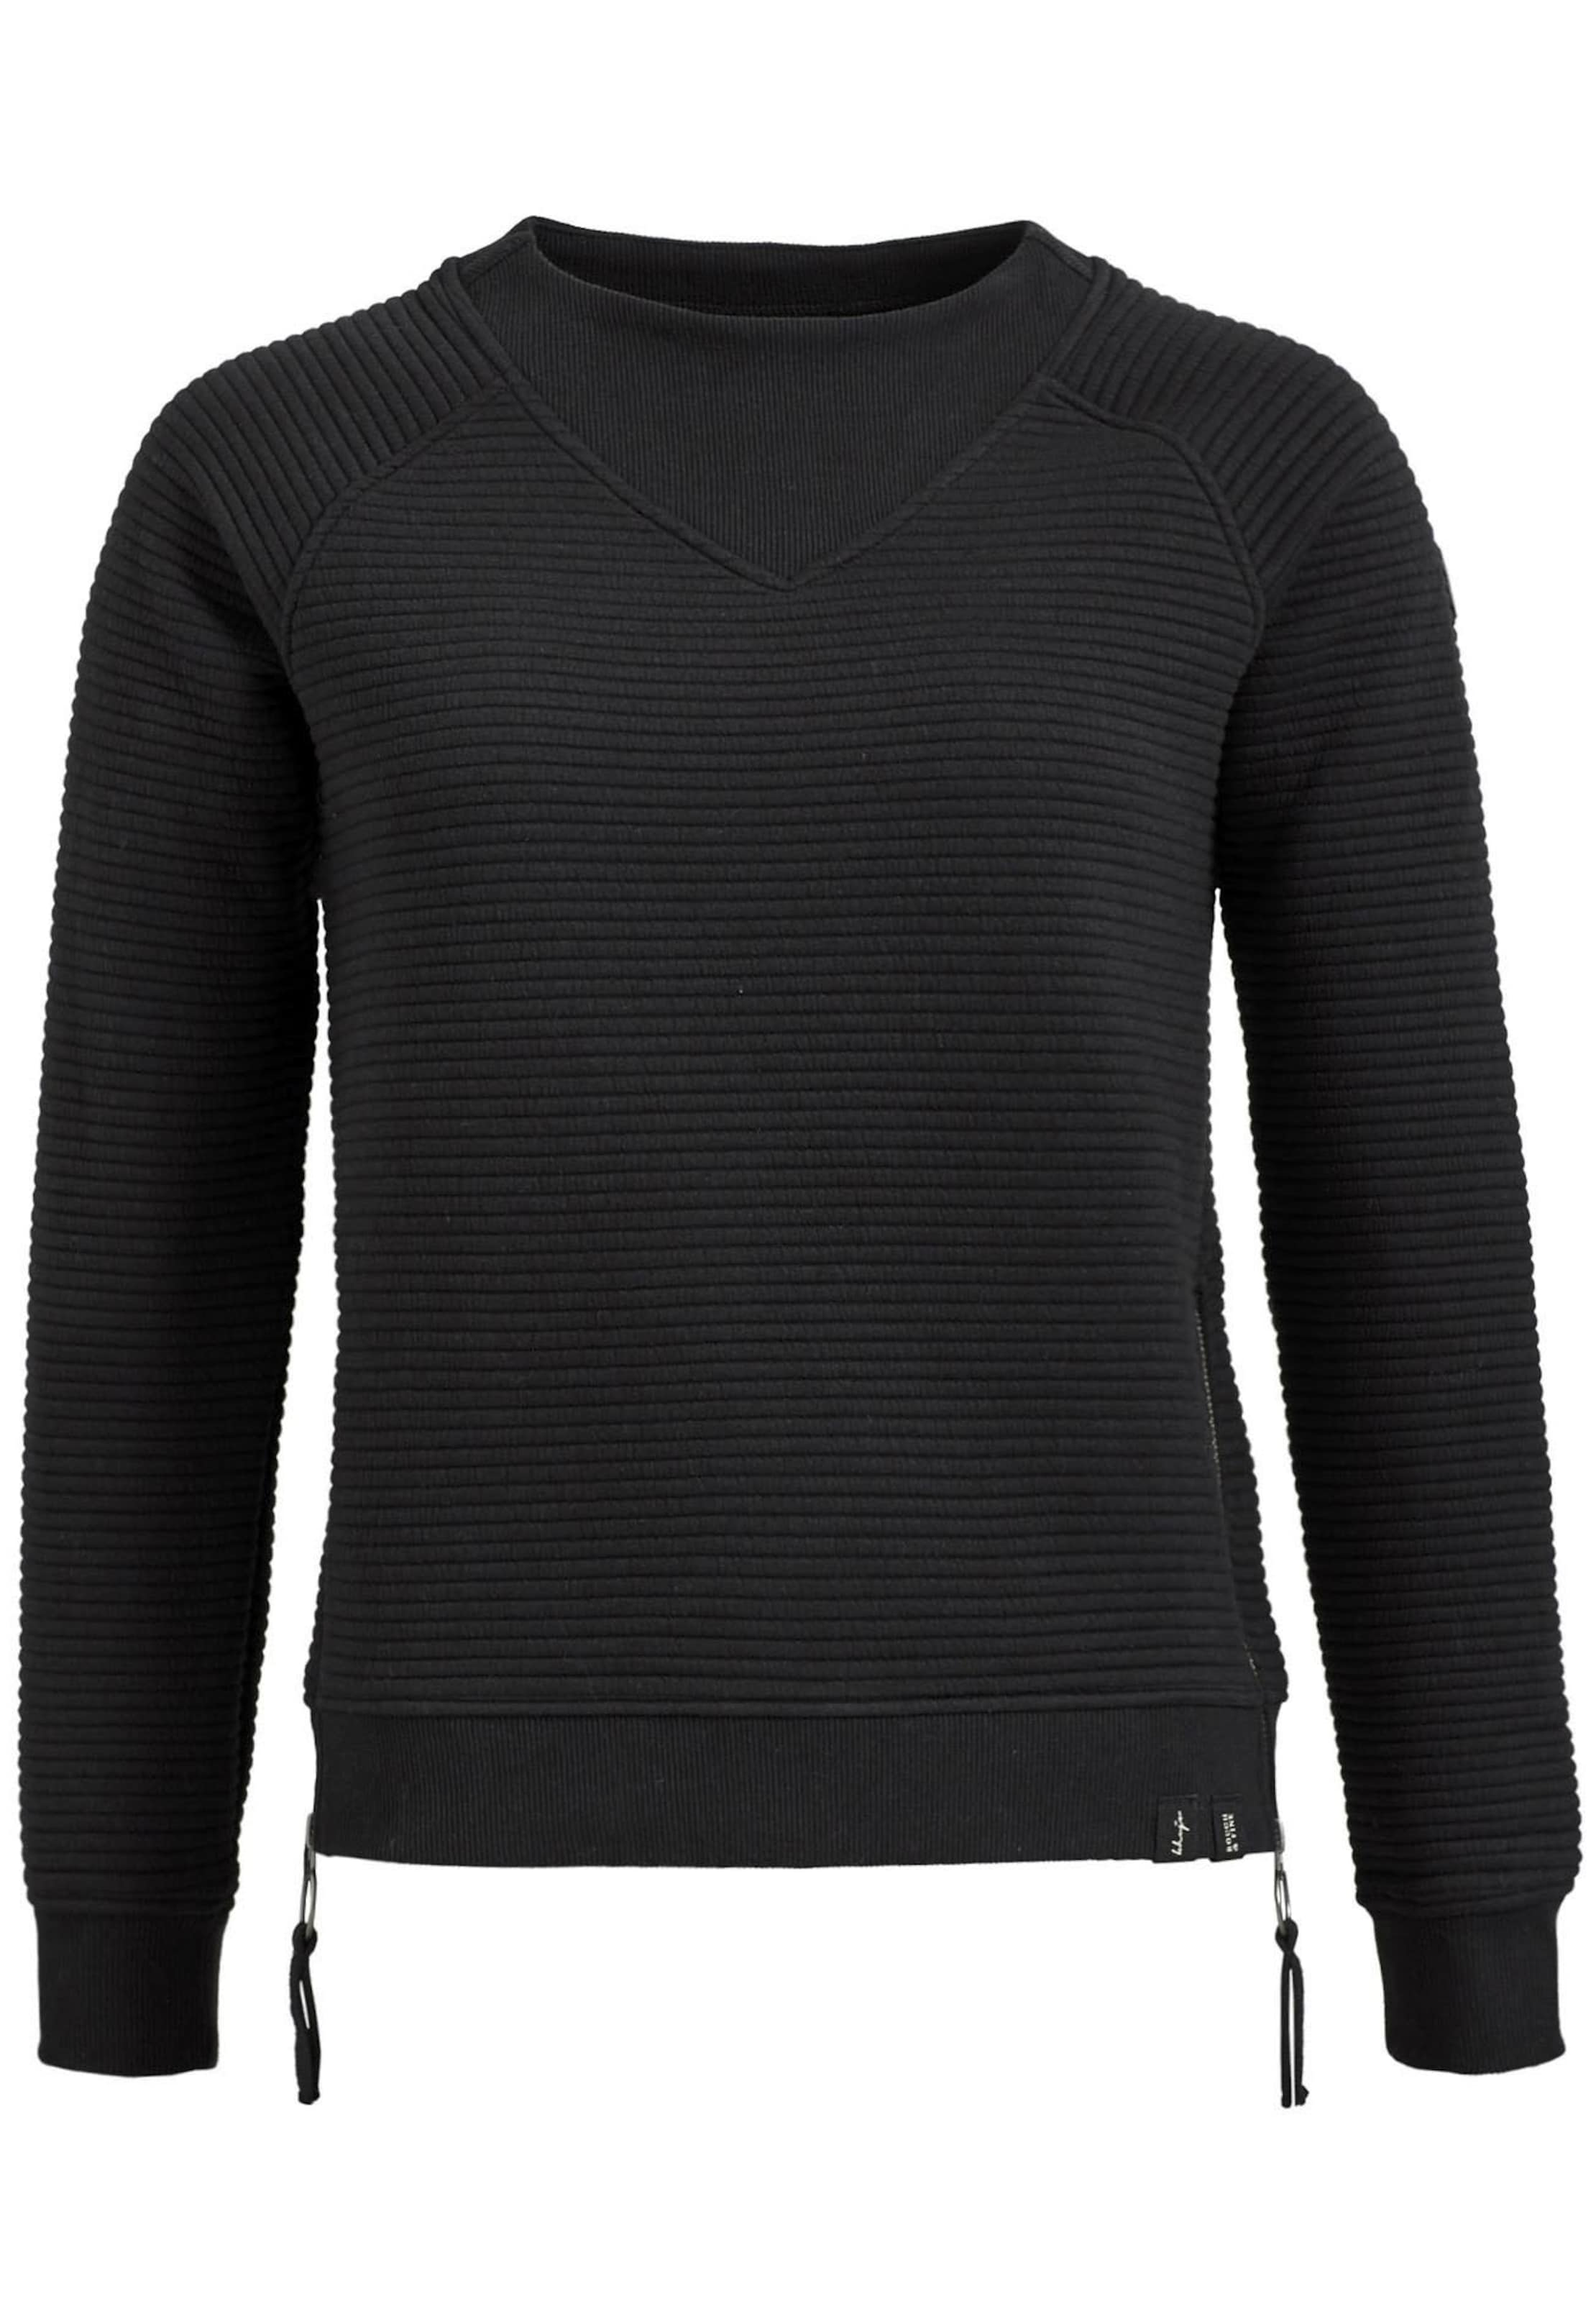 Sweat 'dilara' Noir shirt Khujo En qSpzVGUM